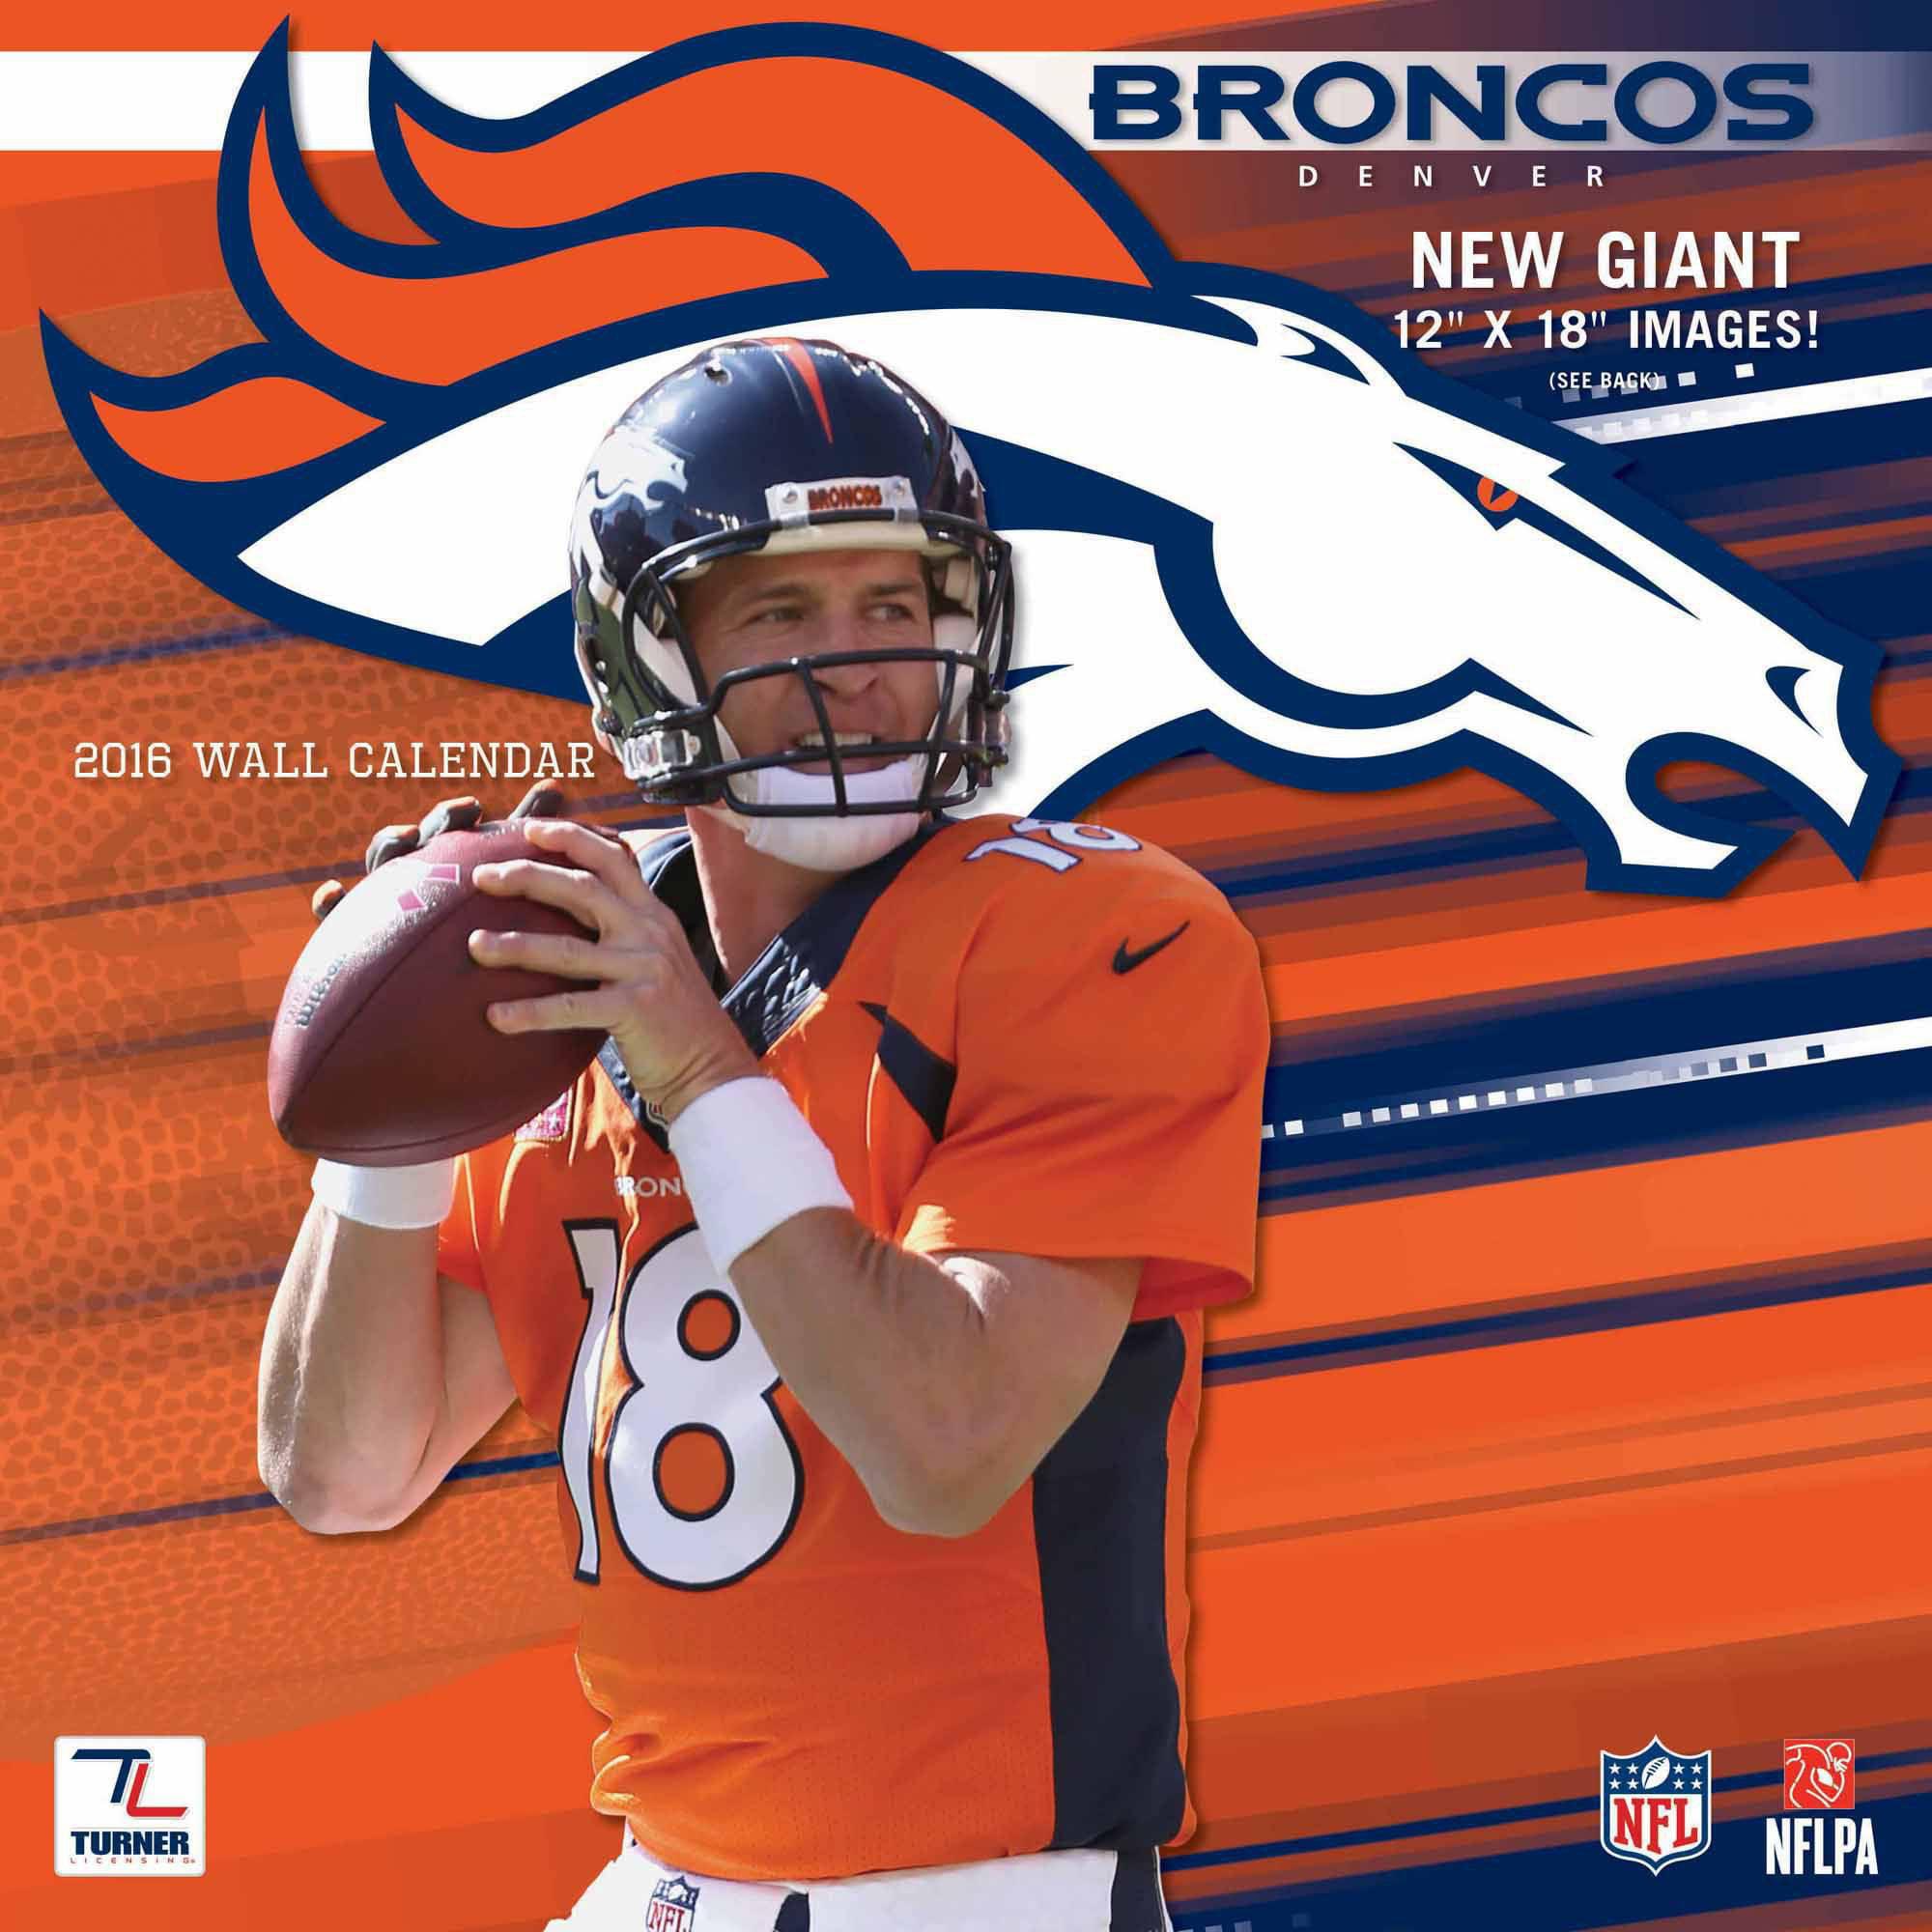 Fanmats Seattle Seahawks 3 Ft X 6 Ft Football Field: 13 Floors Denver Broncos